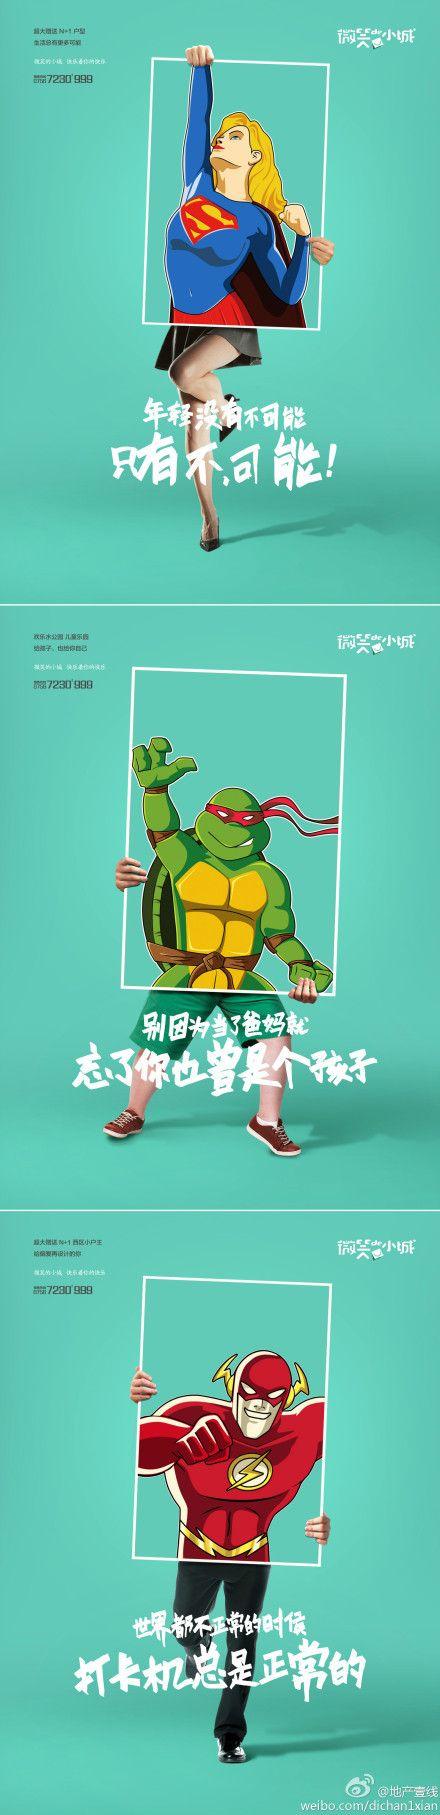 HEROS!!!! //@重庆房地产广告精选: #内案先睹#... パワー 世界観 アウトプットで底上げ アニメ 手持ち ボード ヒーロー スーパーマン タートルズ 勢い かわいい 楽しい